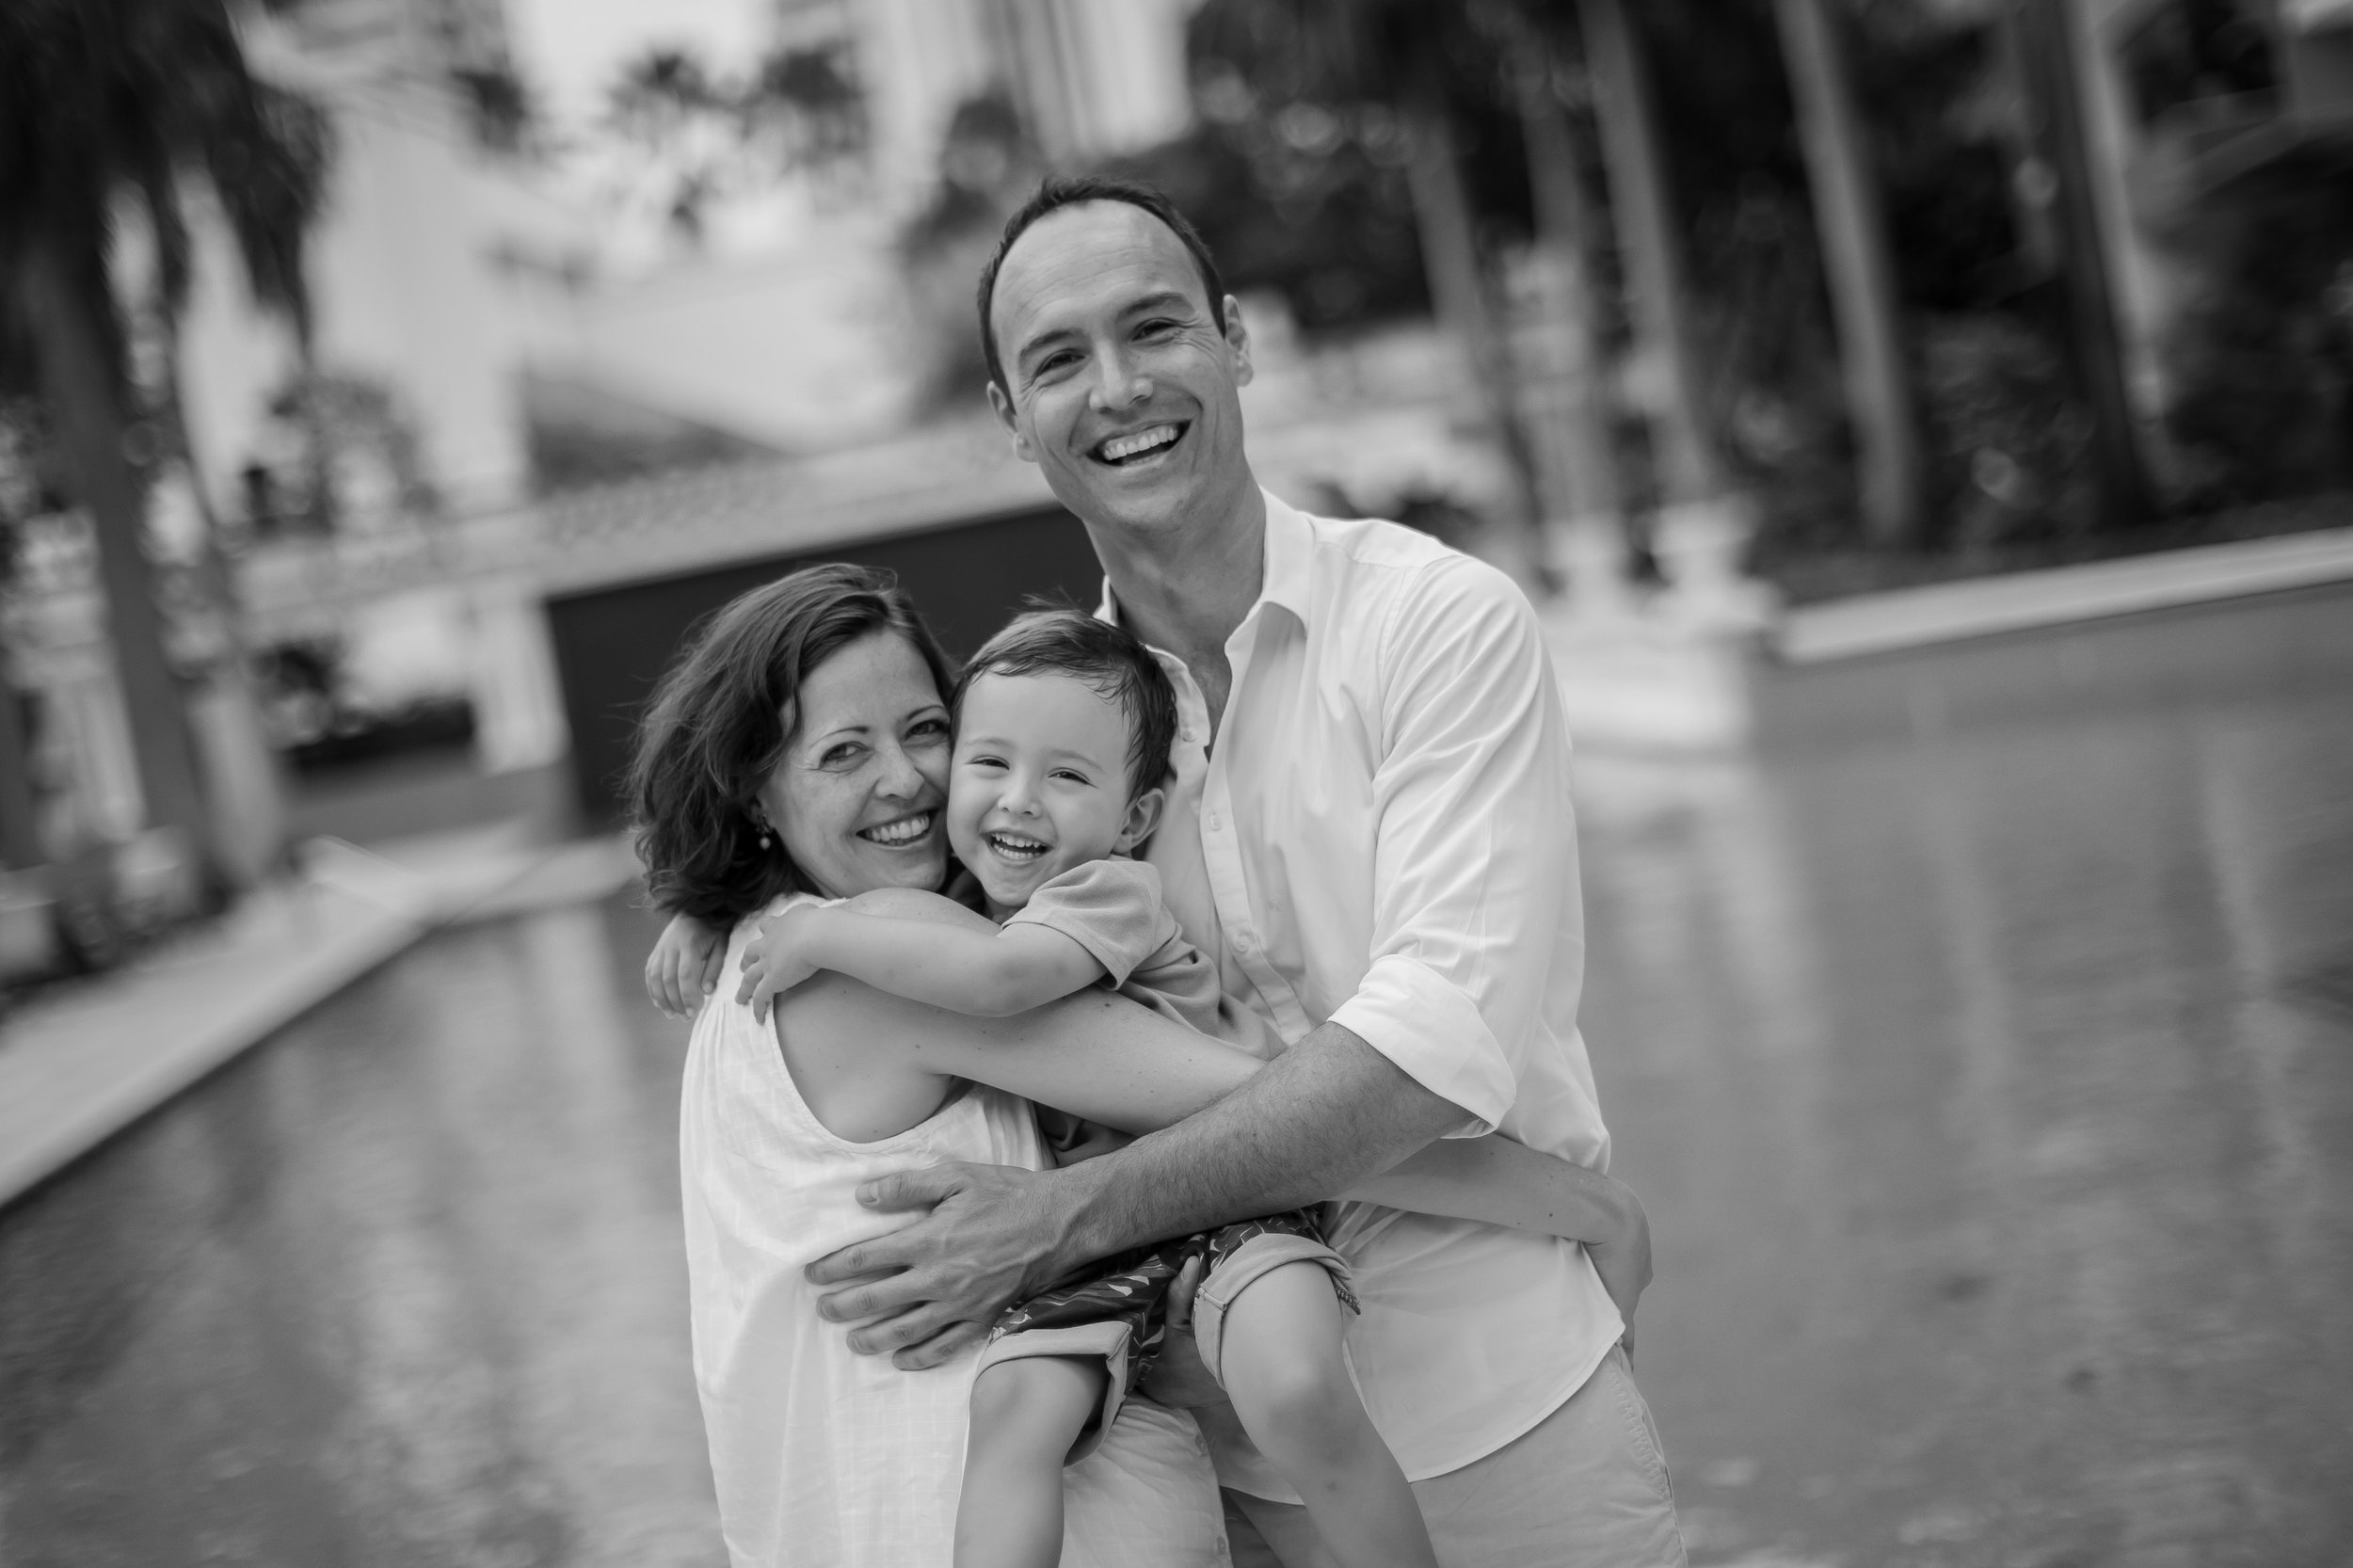 Family Photographer Singapore Vision Photography Daniel Parker home visit